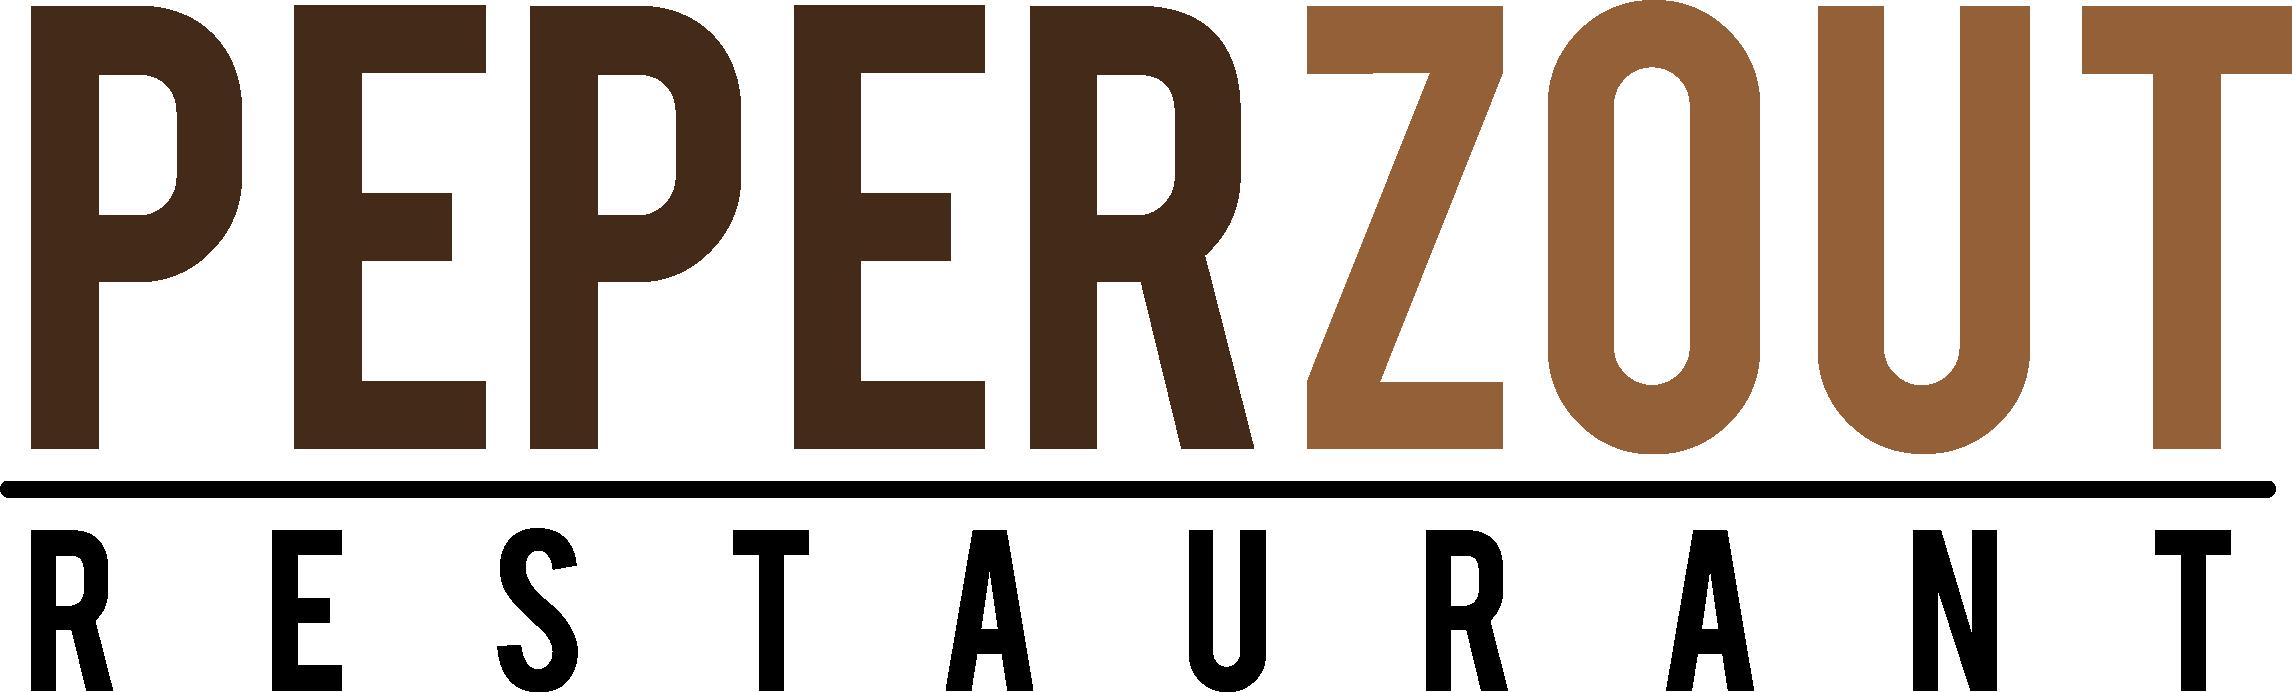 PeperZout Restaurant in Haarlem | Mediterraanse Turkse Ontbijt, Lunch en Diner!